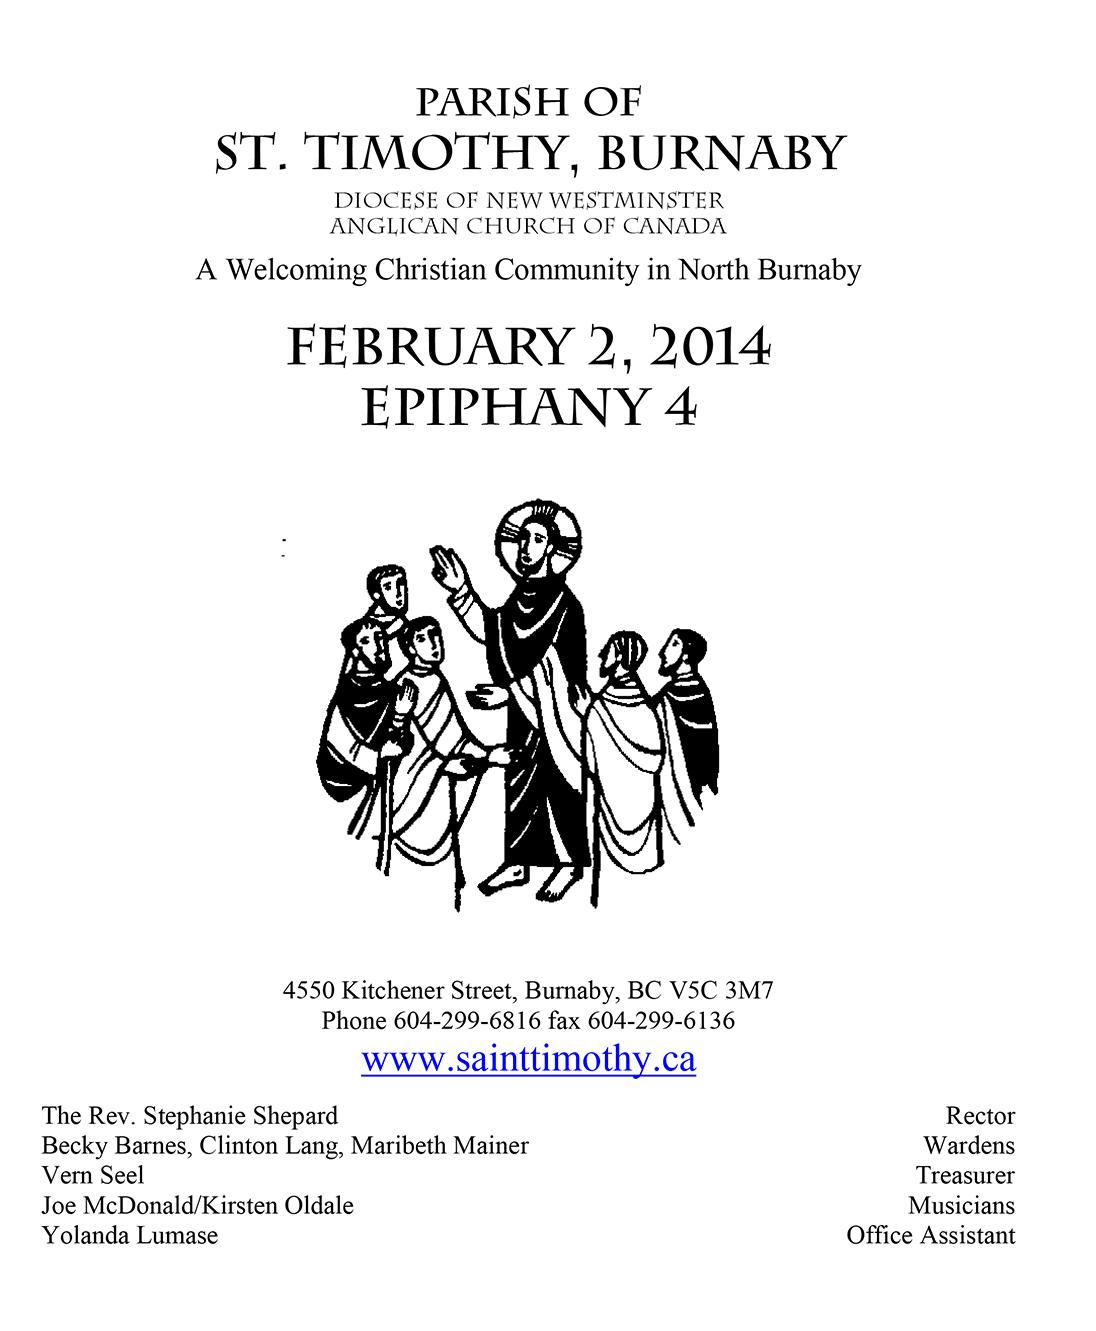 Bulletin: February 2, 2014